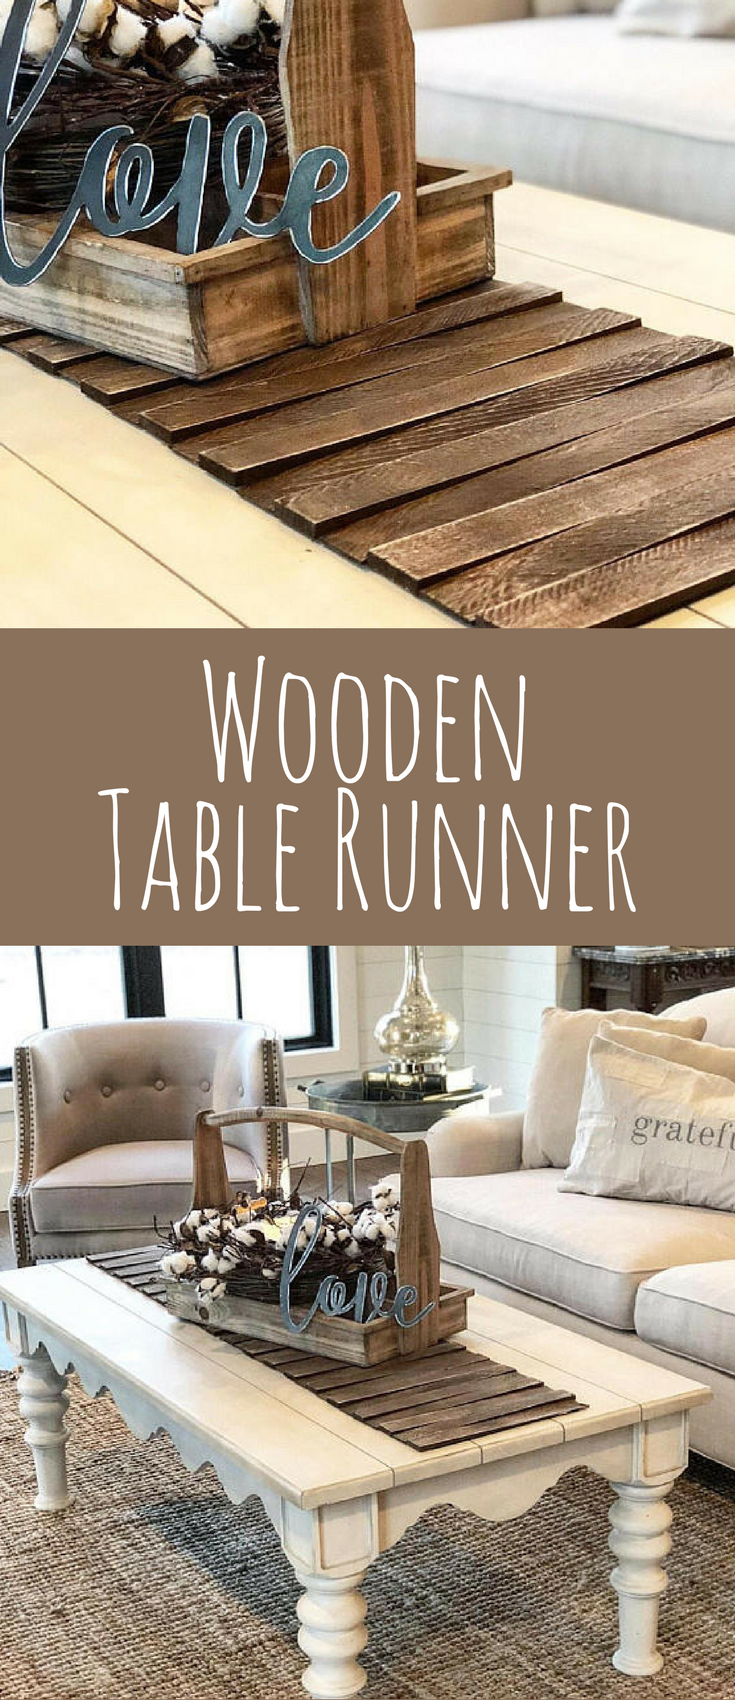 Wooden Table Runner Rustic Home Decor Tabletop Centerpiece Tabletop Decor Farmhouse Decor Wood Farmhouse Table Decor Table Top Decor Rustic Tabletop